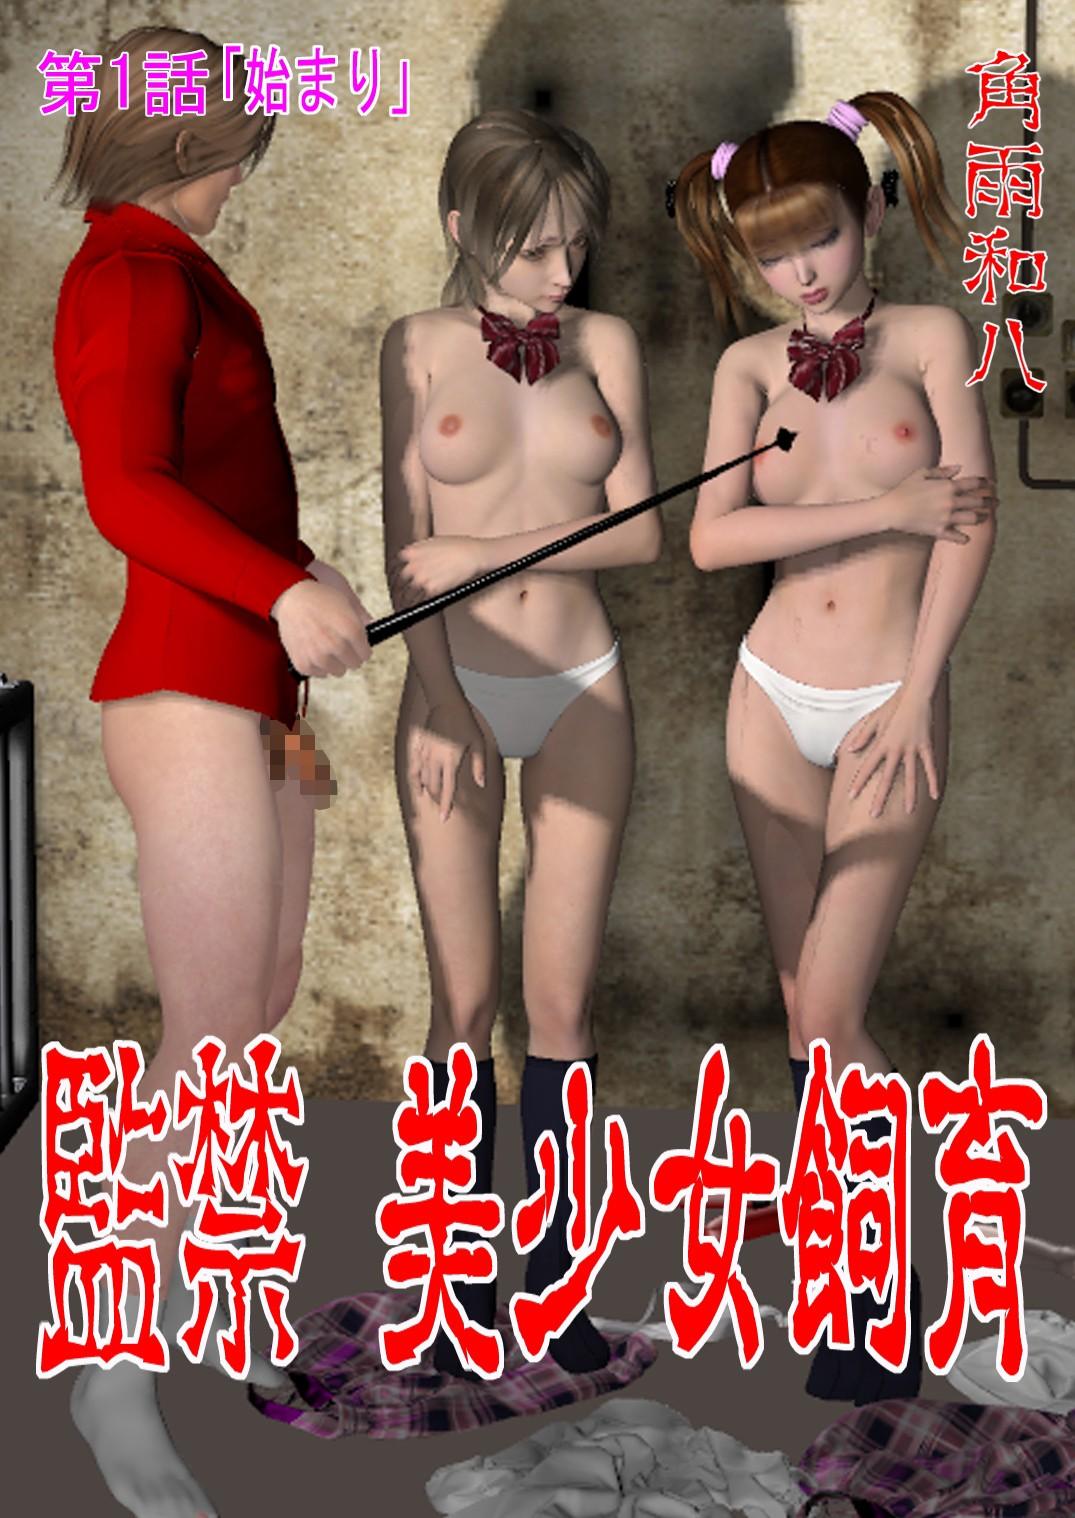 AVアニメなう [今すぐ読める同人サンプル] 「監禁 美少女飼育」(角雨和八(つのあめかずや))